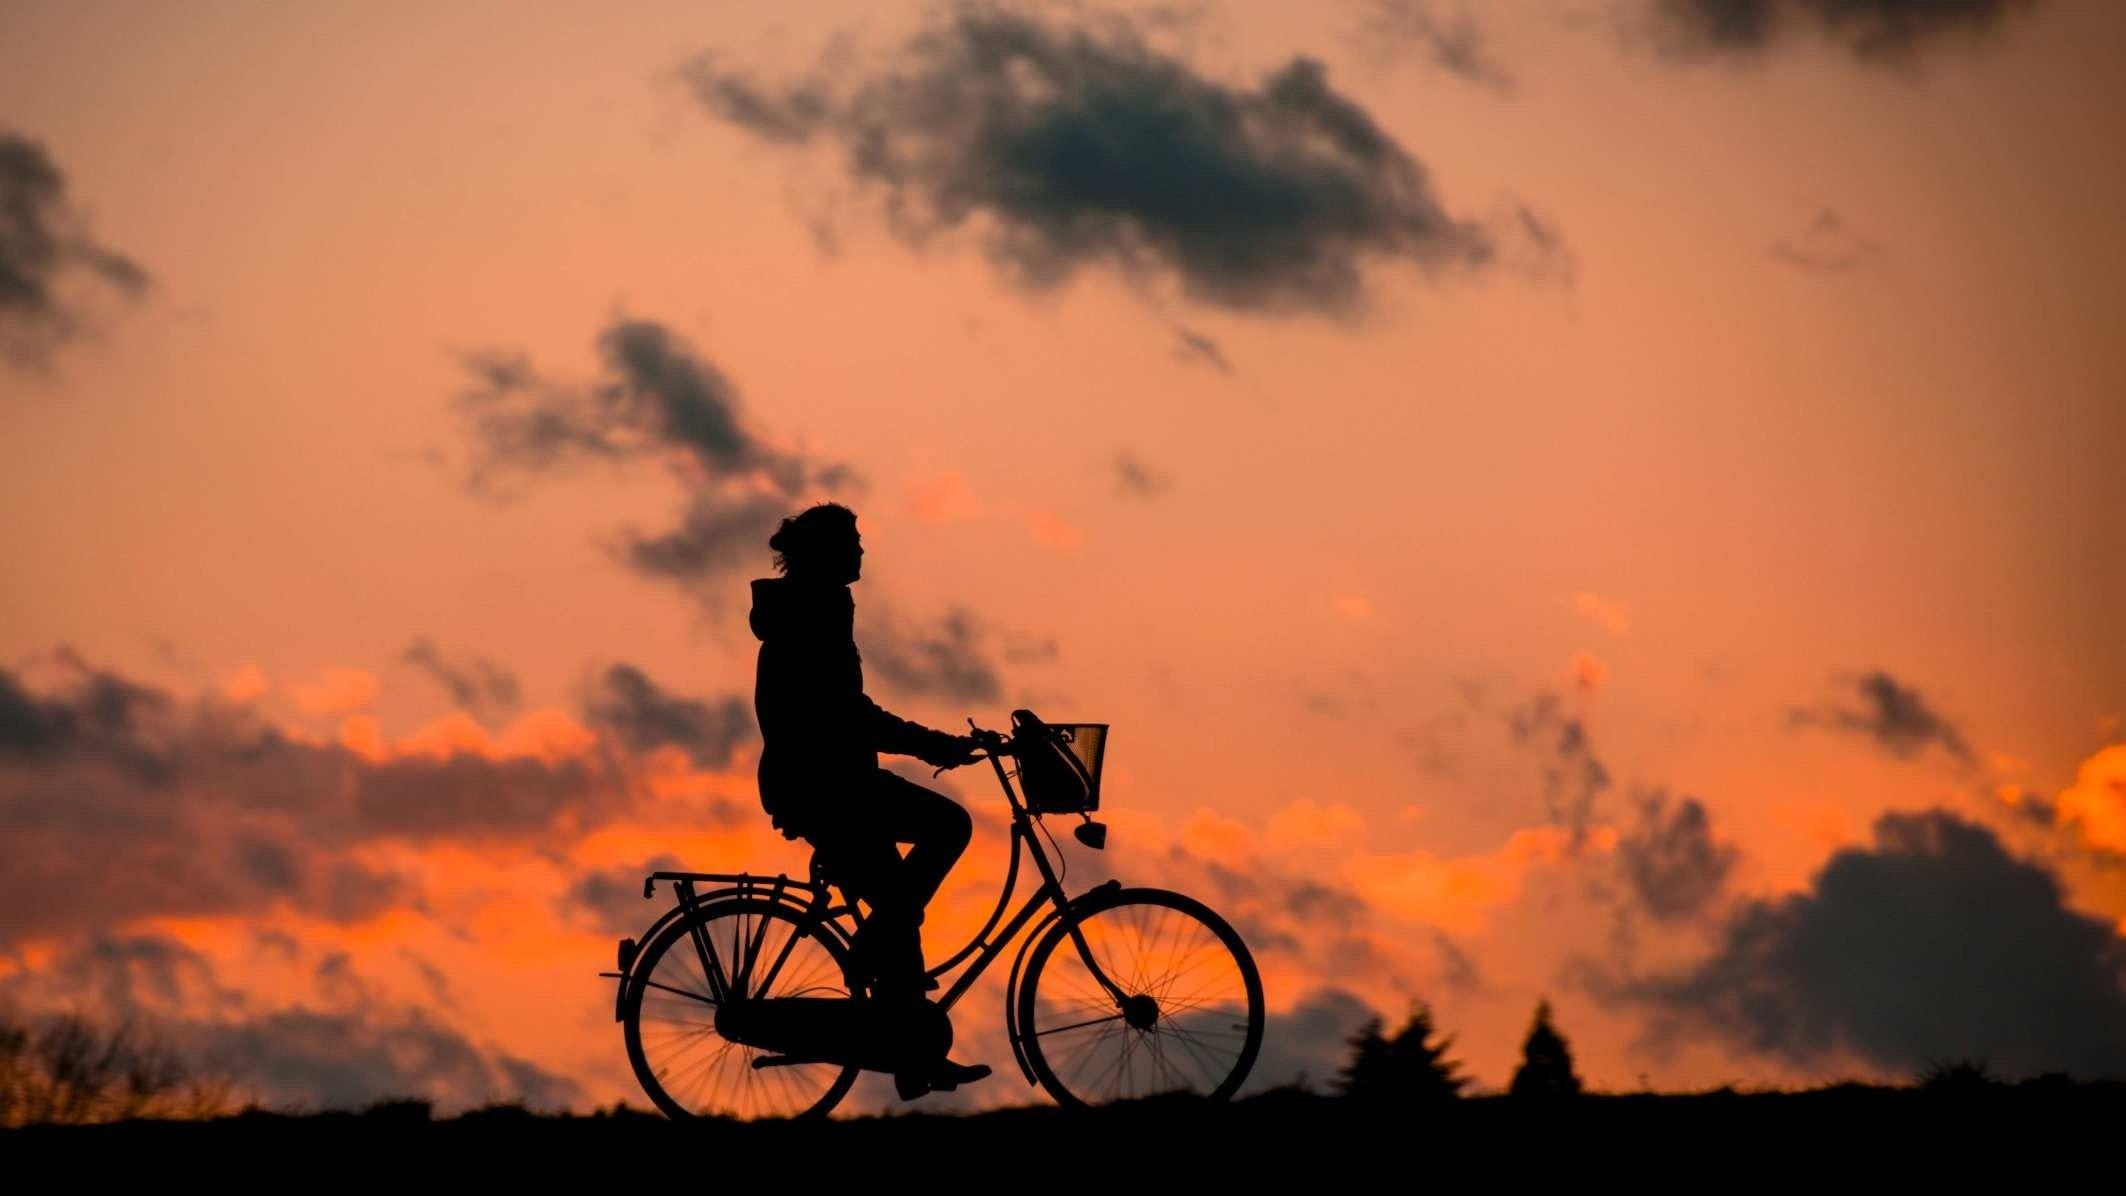 Silueta de hombre en bicicleta al atardecer. Cosas que hacer antes de que haga calor